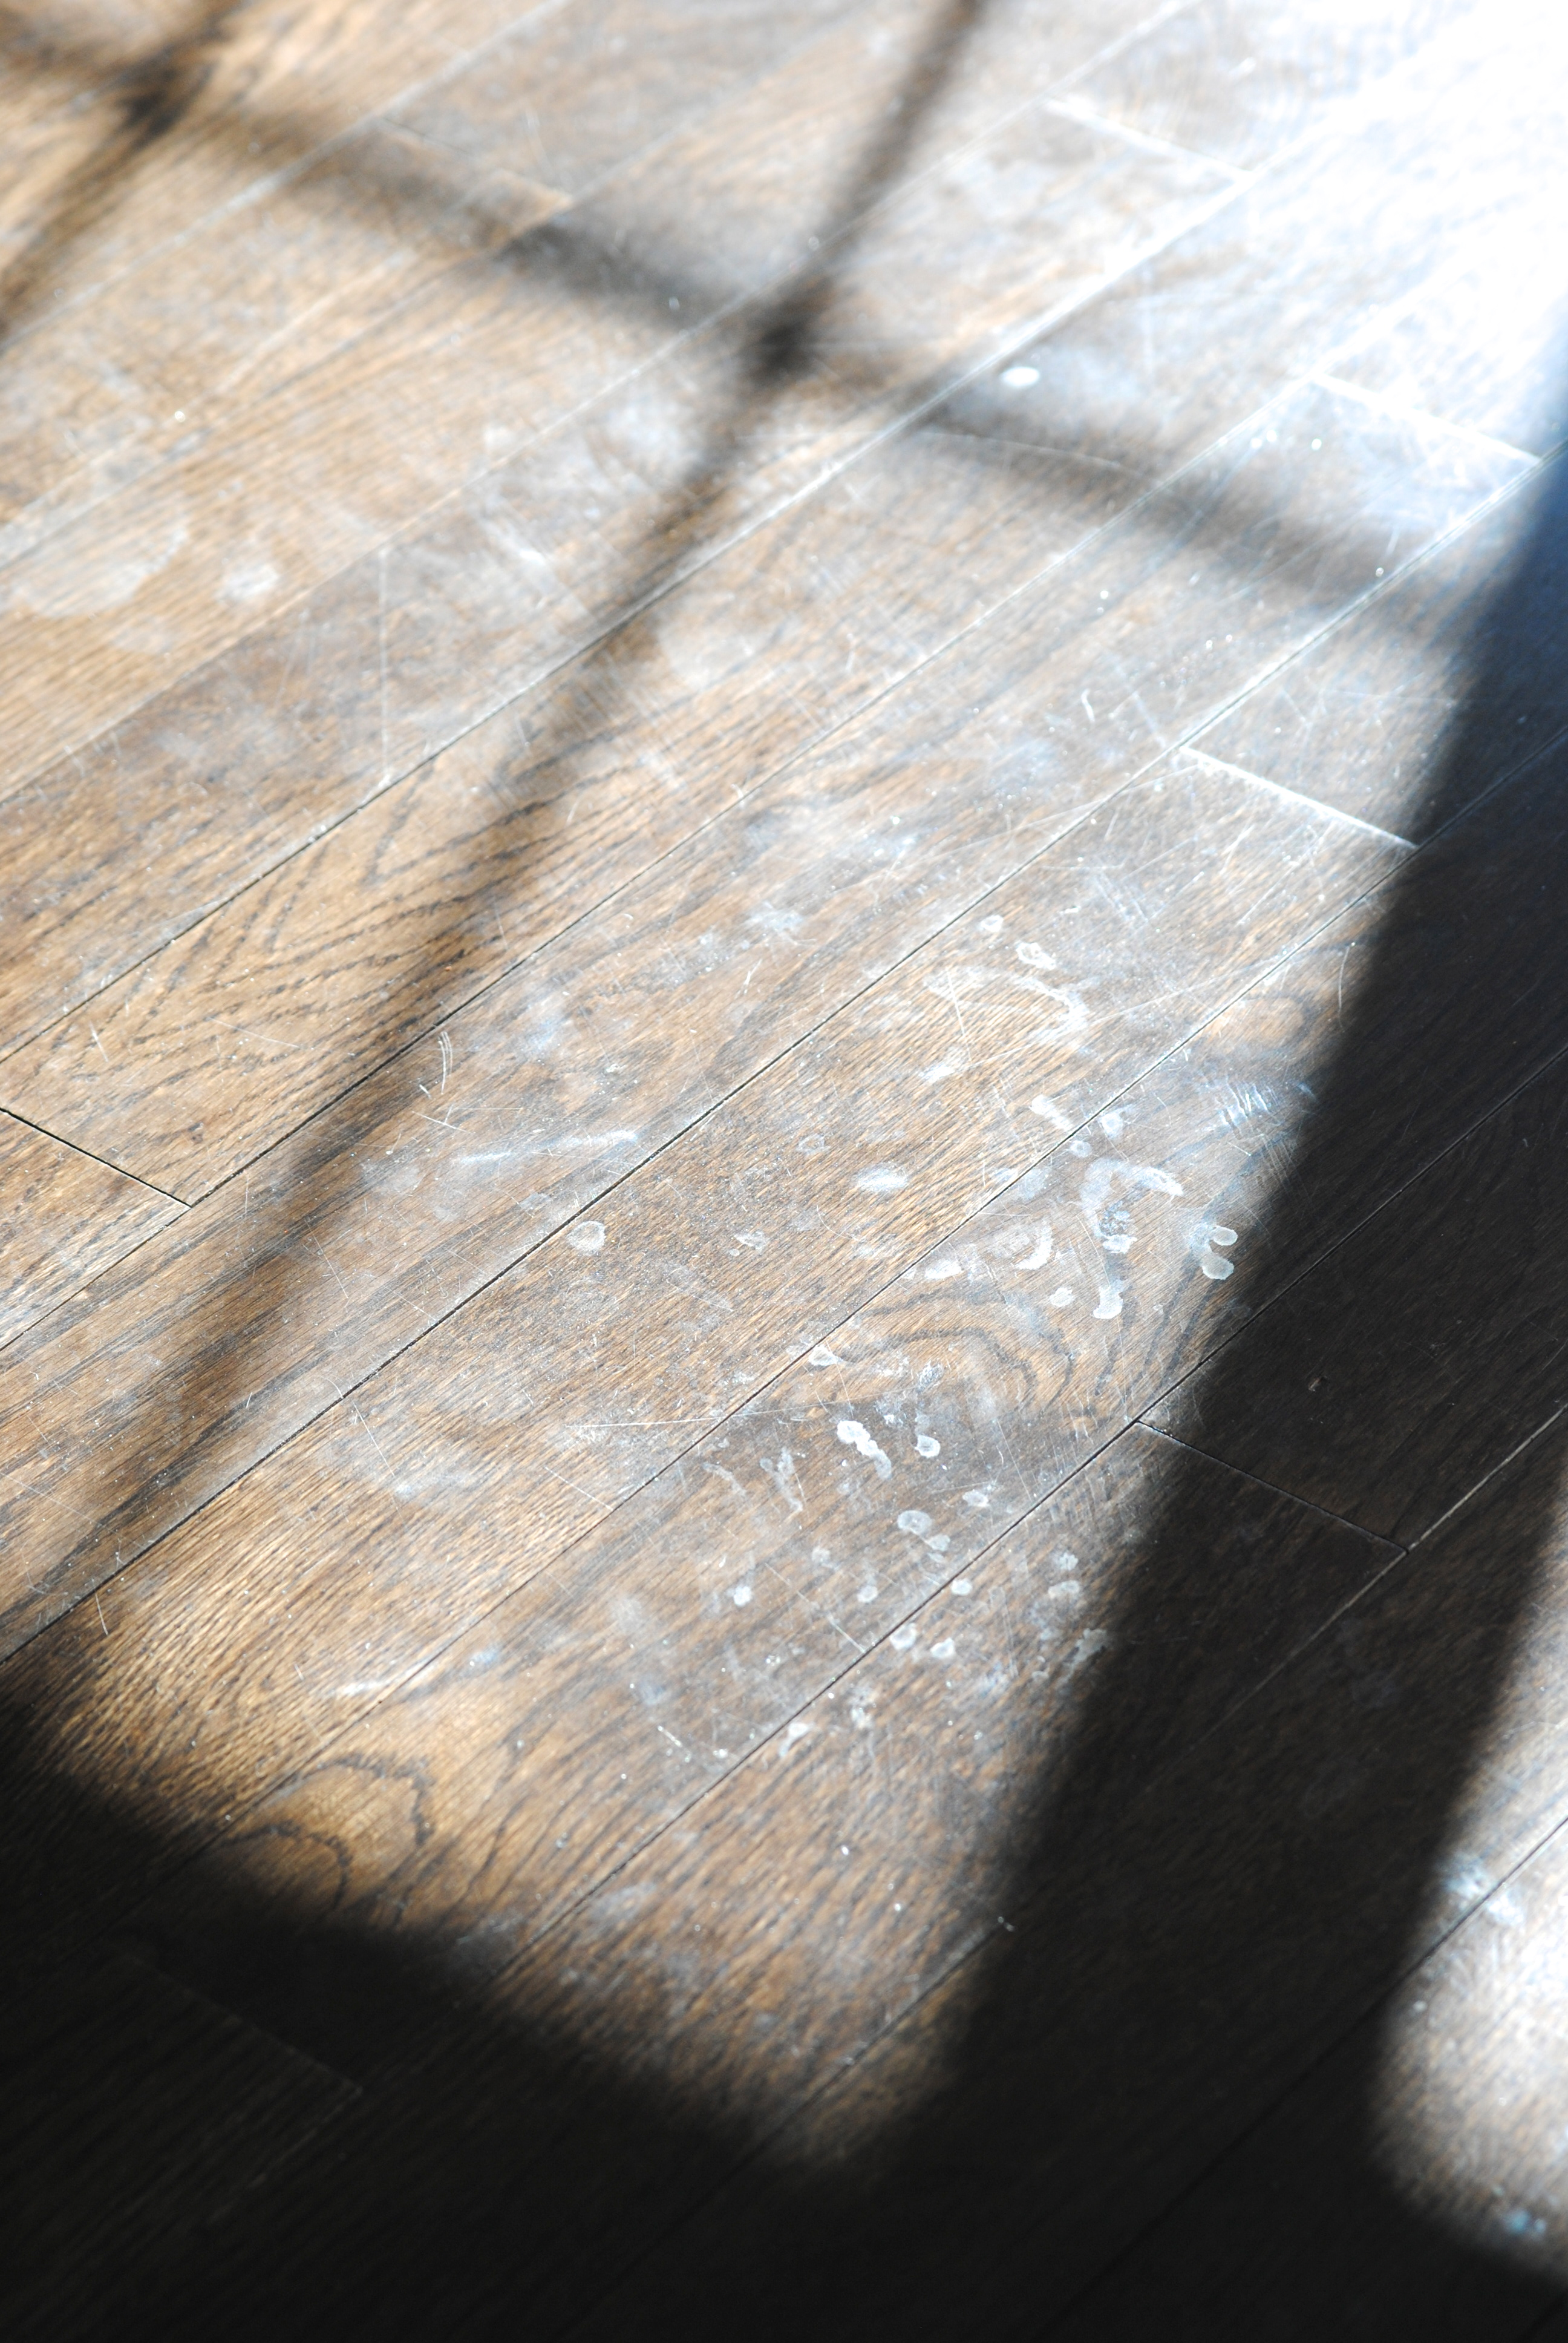 How To Clean Hardwood Floors And Microfiber Furniture